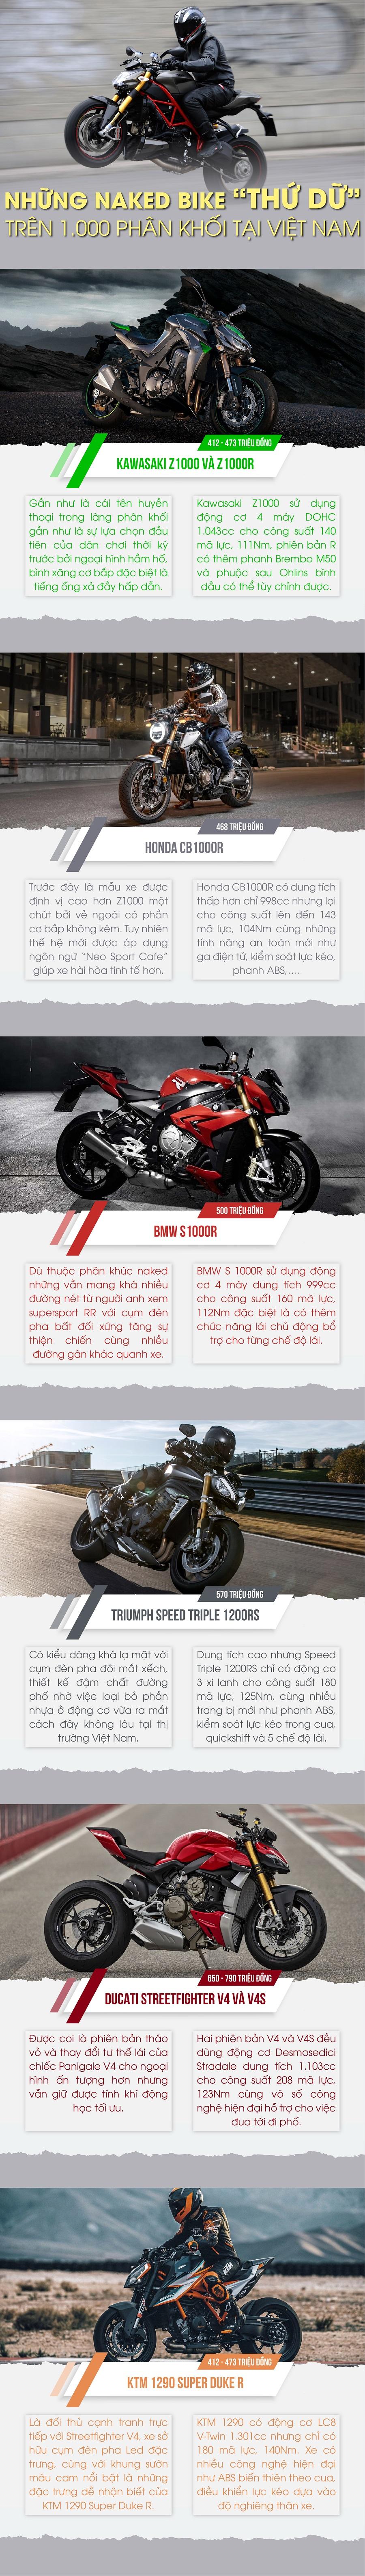 nhung-chiec-naked-bike-thu-du-tren-1-000-phan-khoi-tai-viet-nam